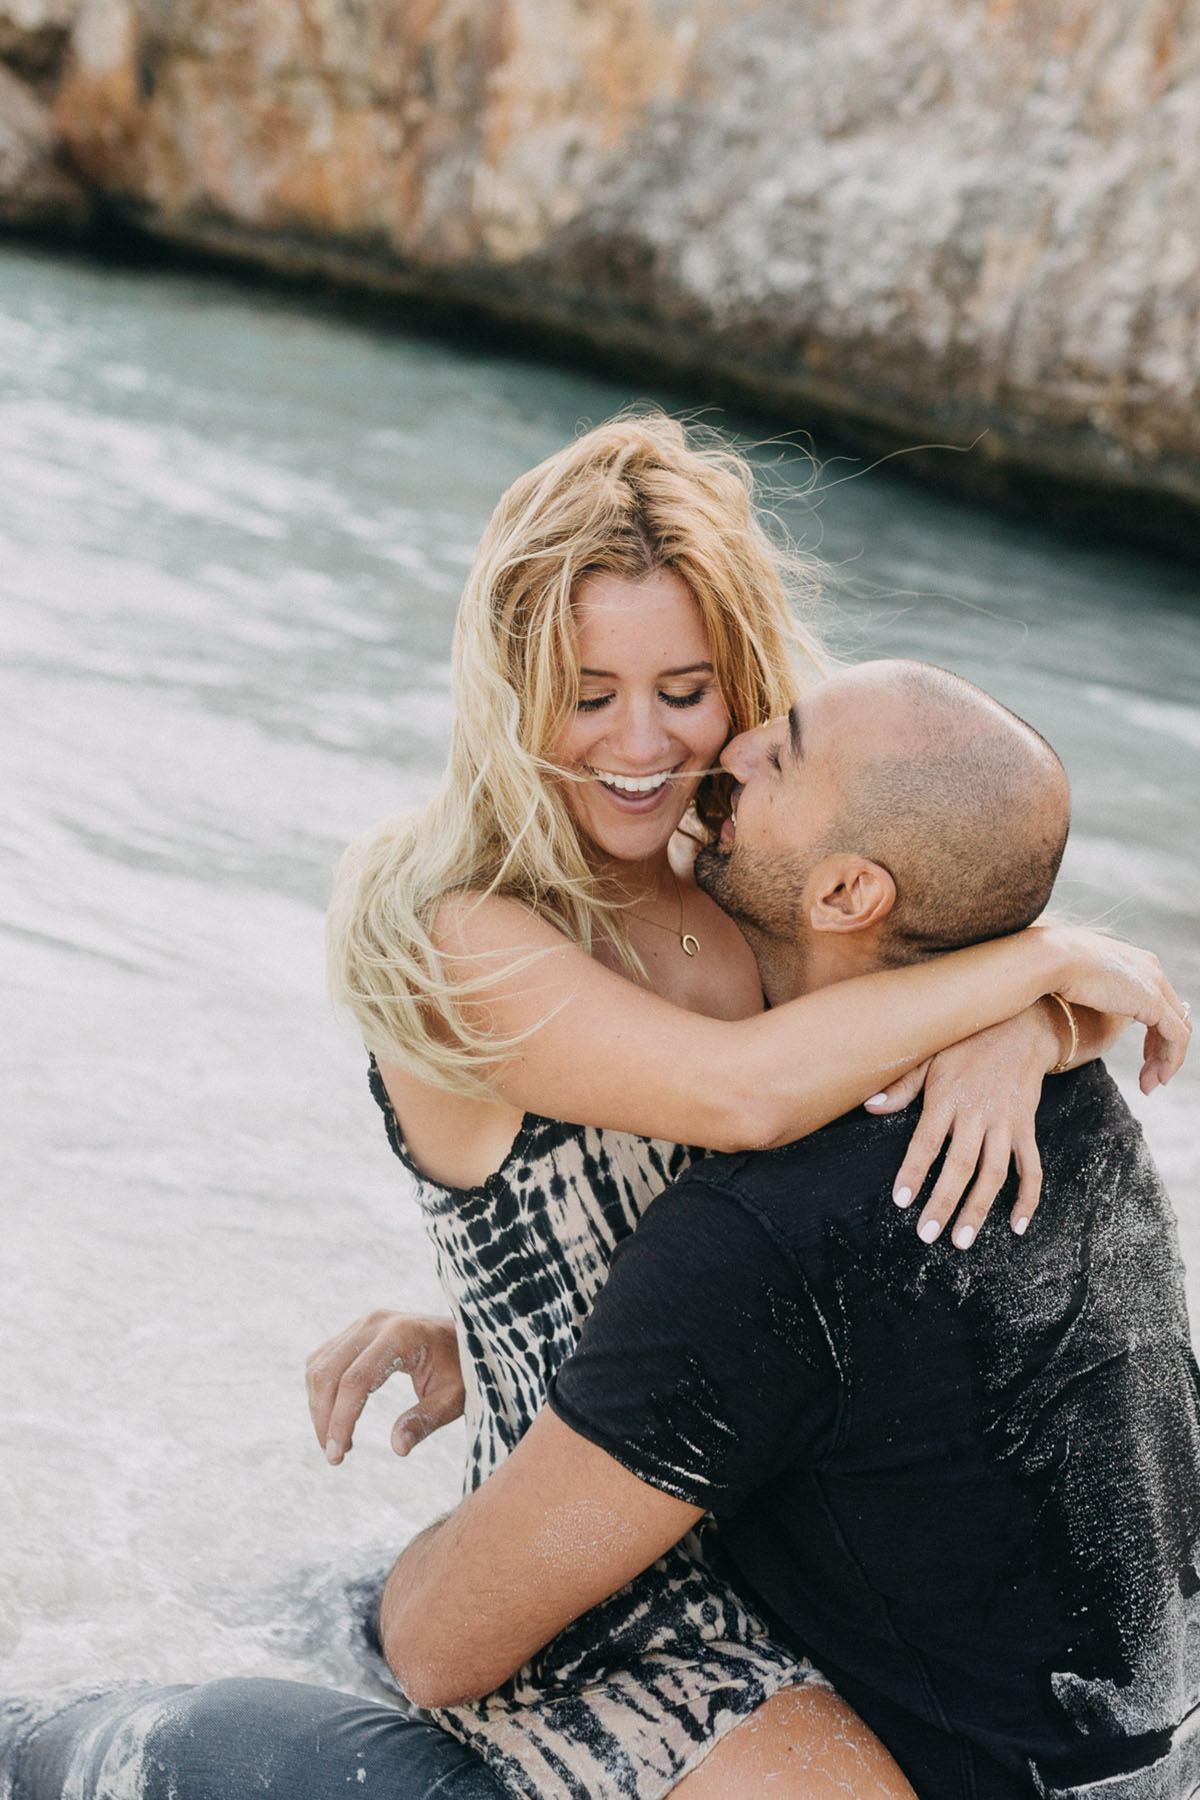 cala d or honeymoon photo shoot - Photographer Cala d'Or | Intimate couple photo shoot in Mallorca